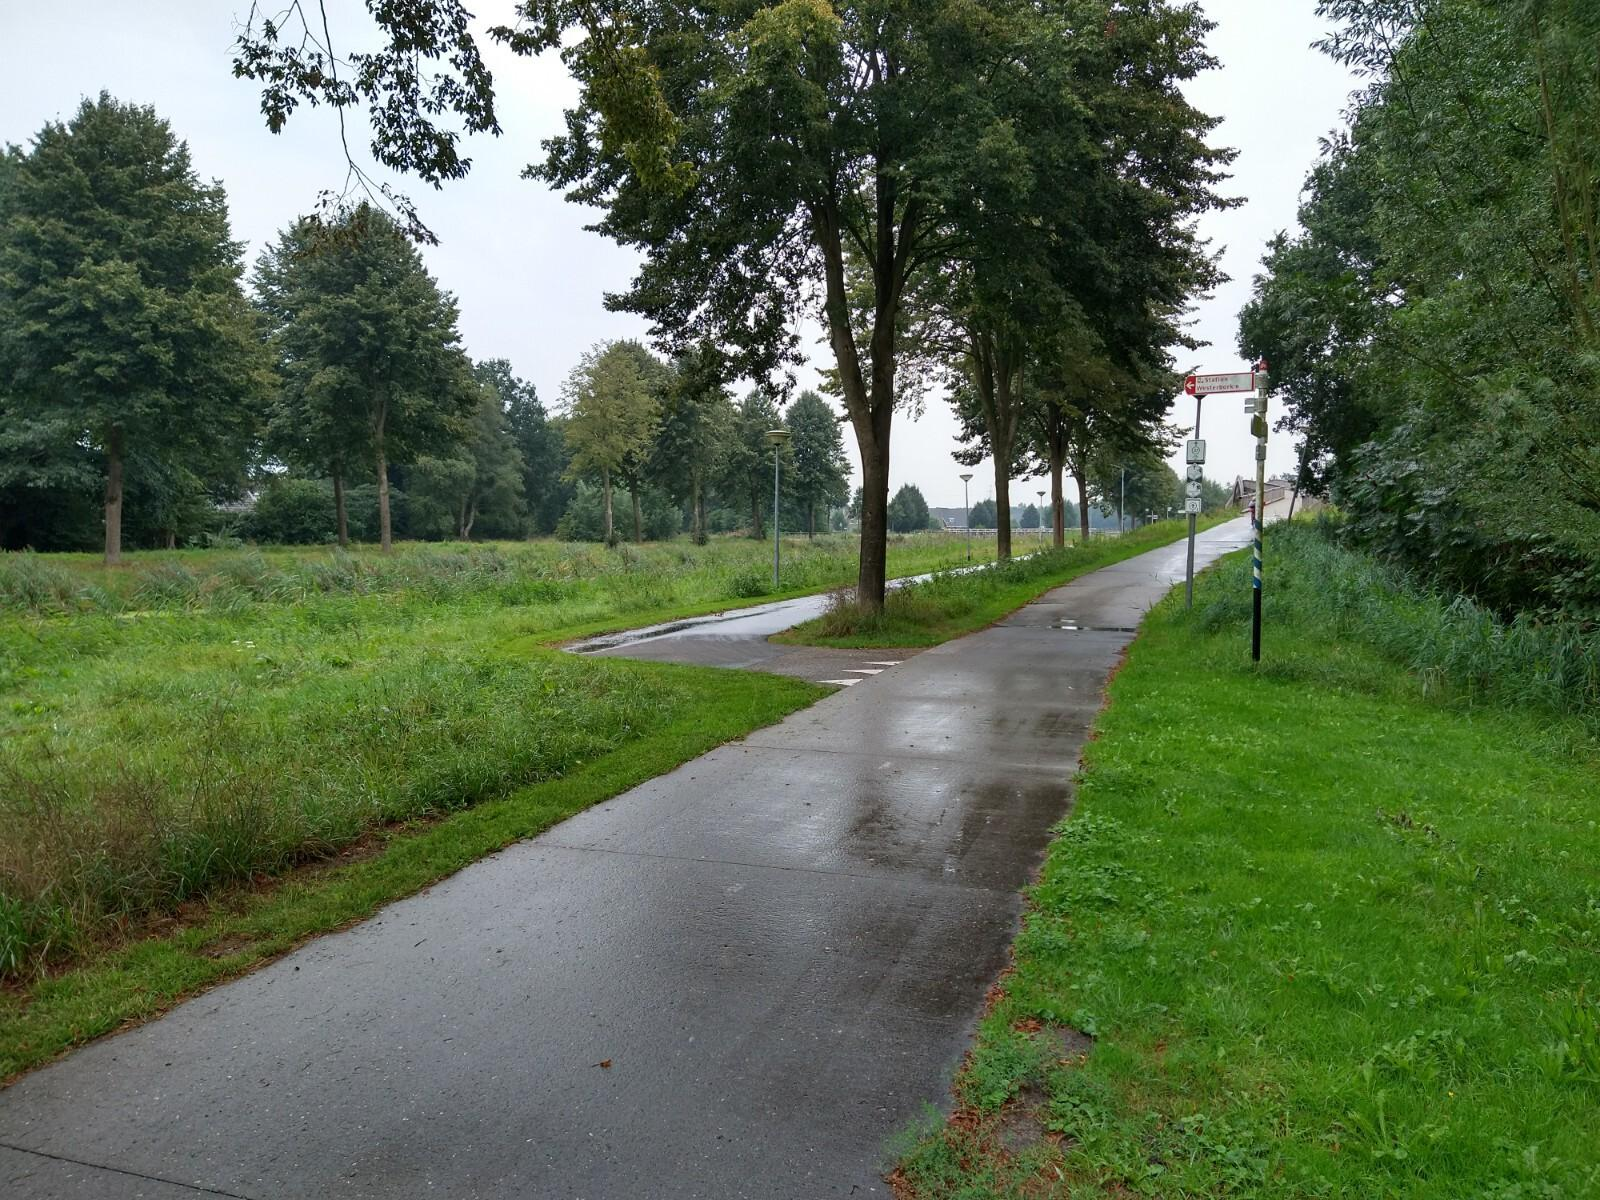 Schakelroute Bottervolk - Nagtegael